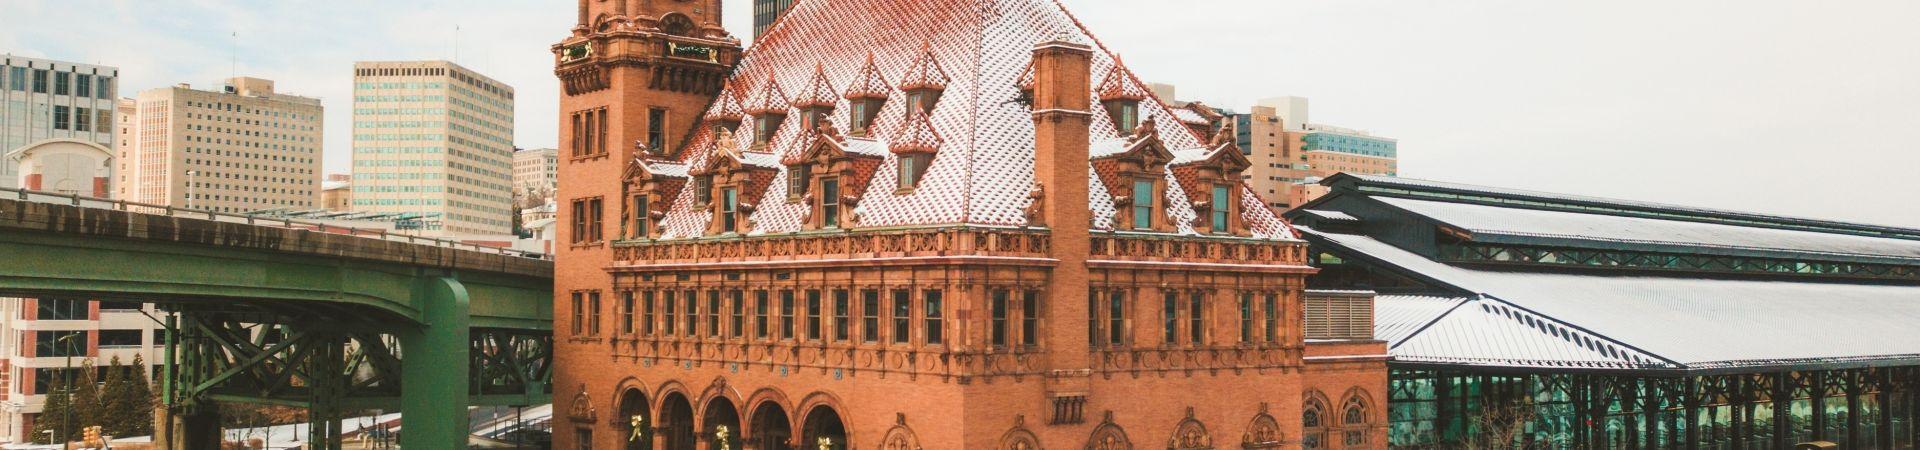 04 richmond virginia - shockoe bottom neighborhood - main street station - train travel events venue - historic landmark